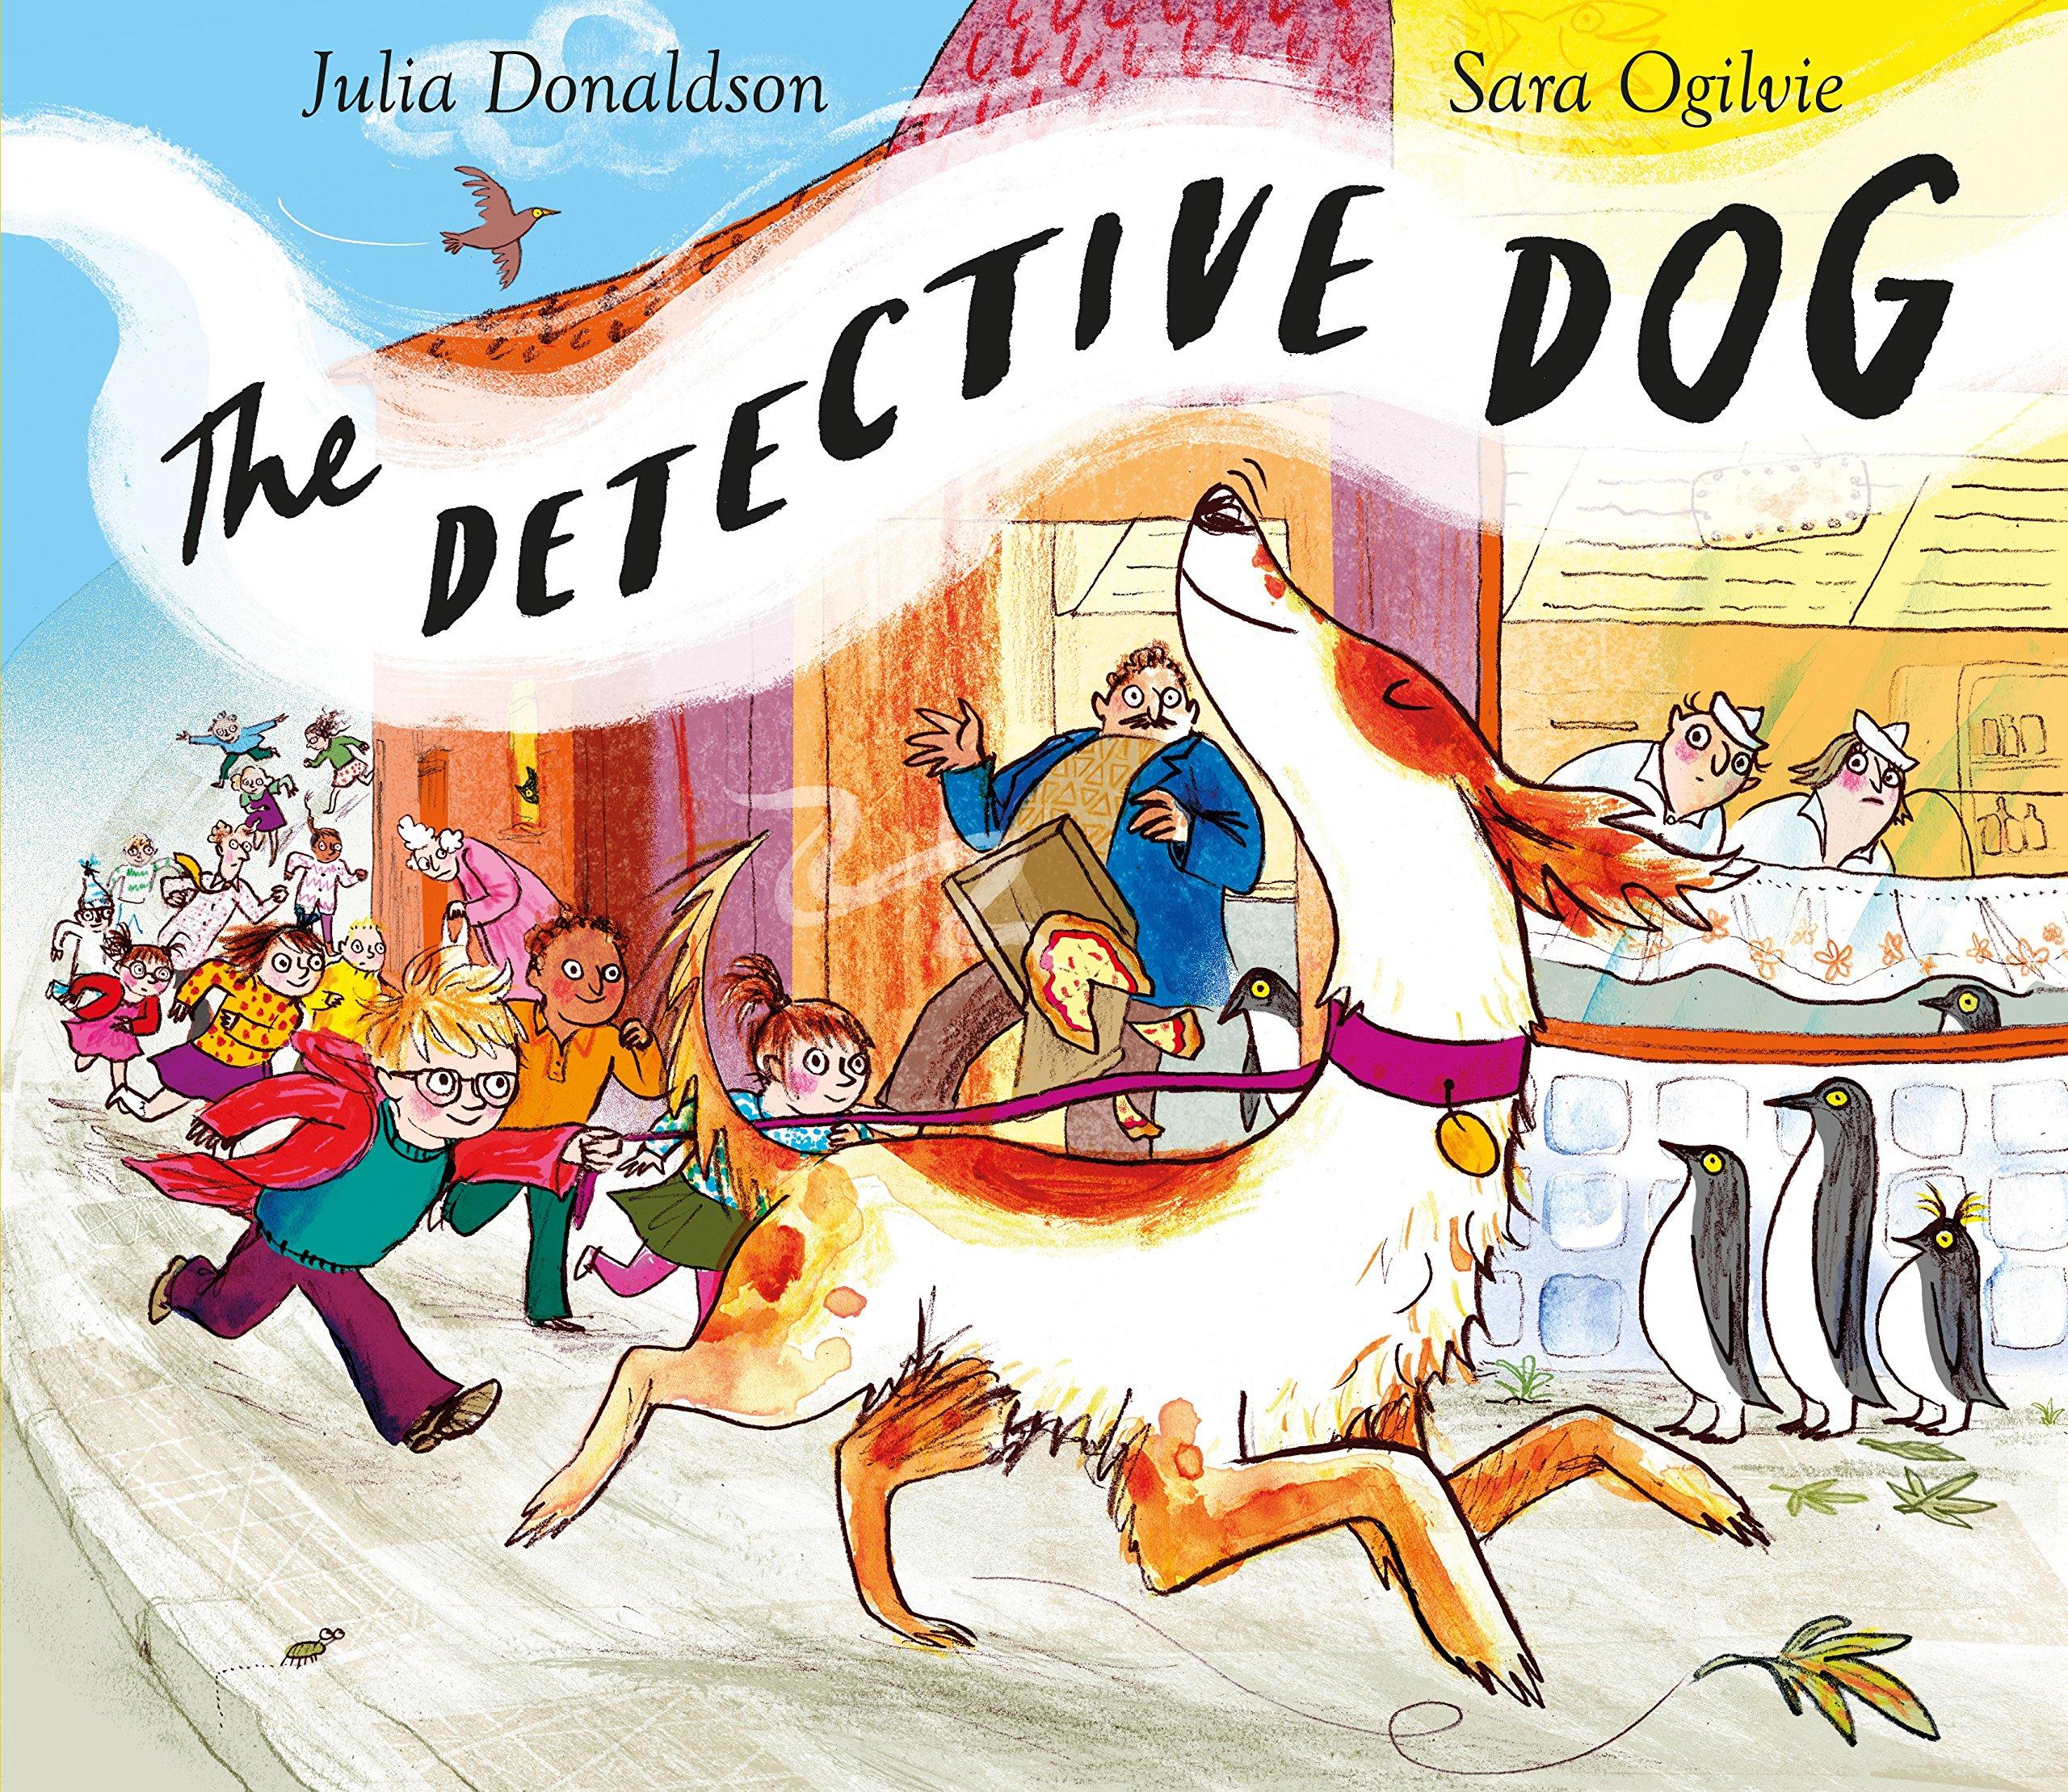 The Detective Dog sense and sensibility